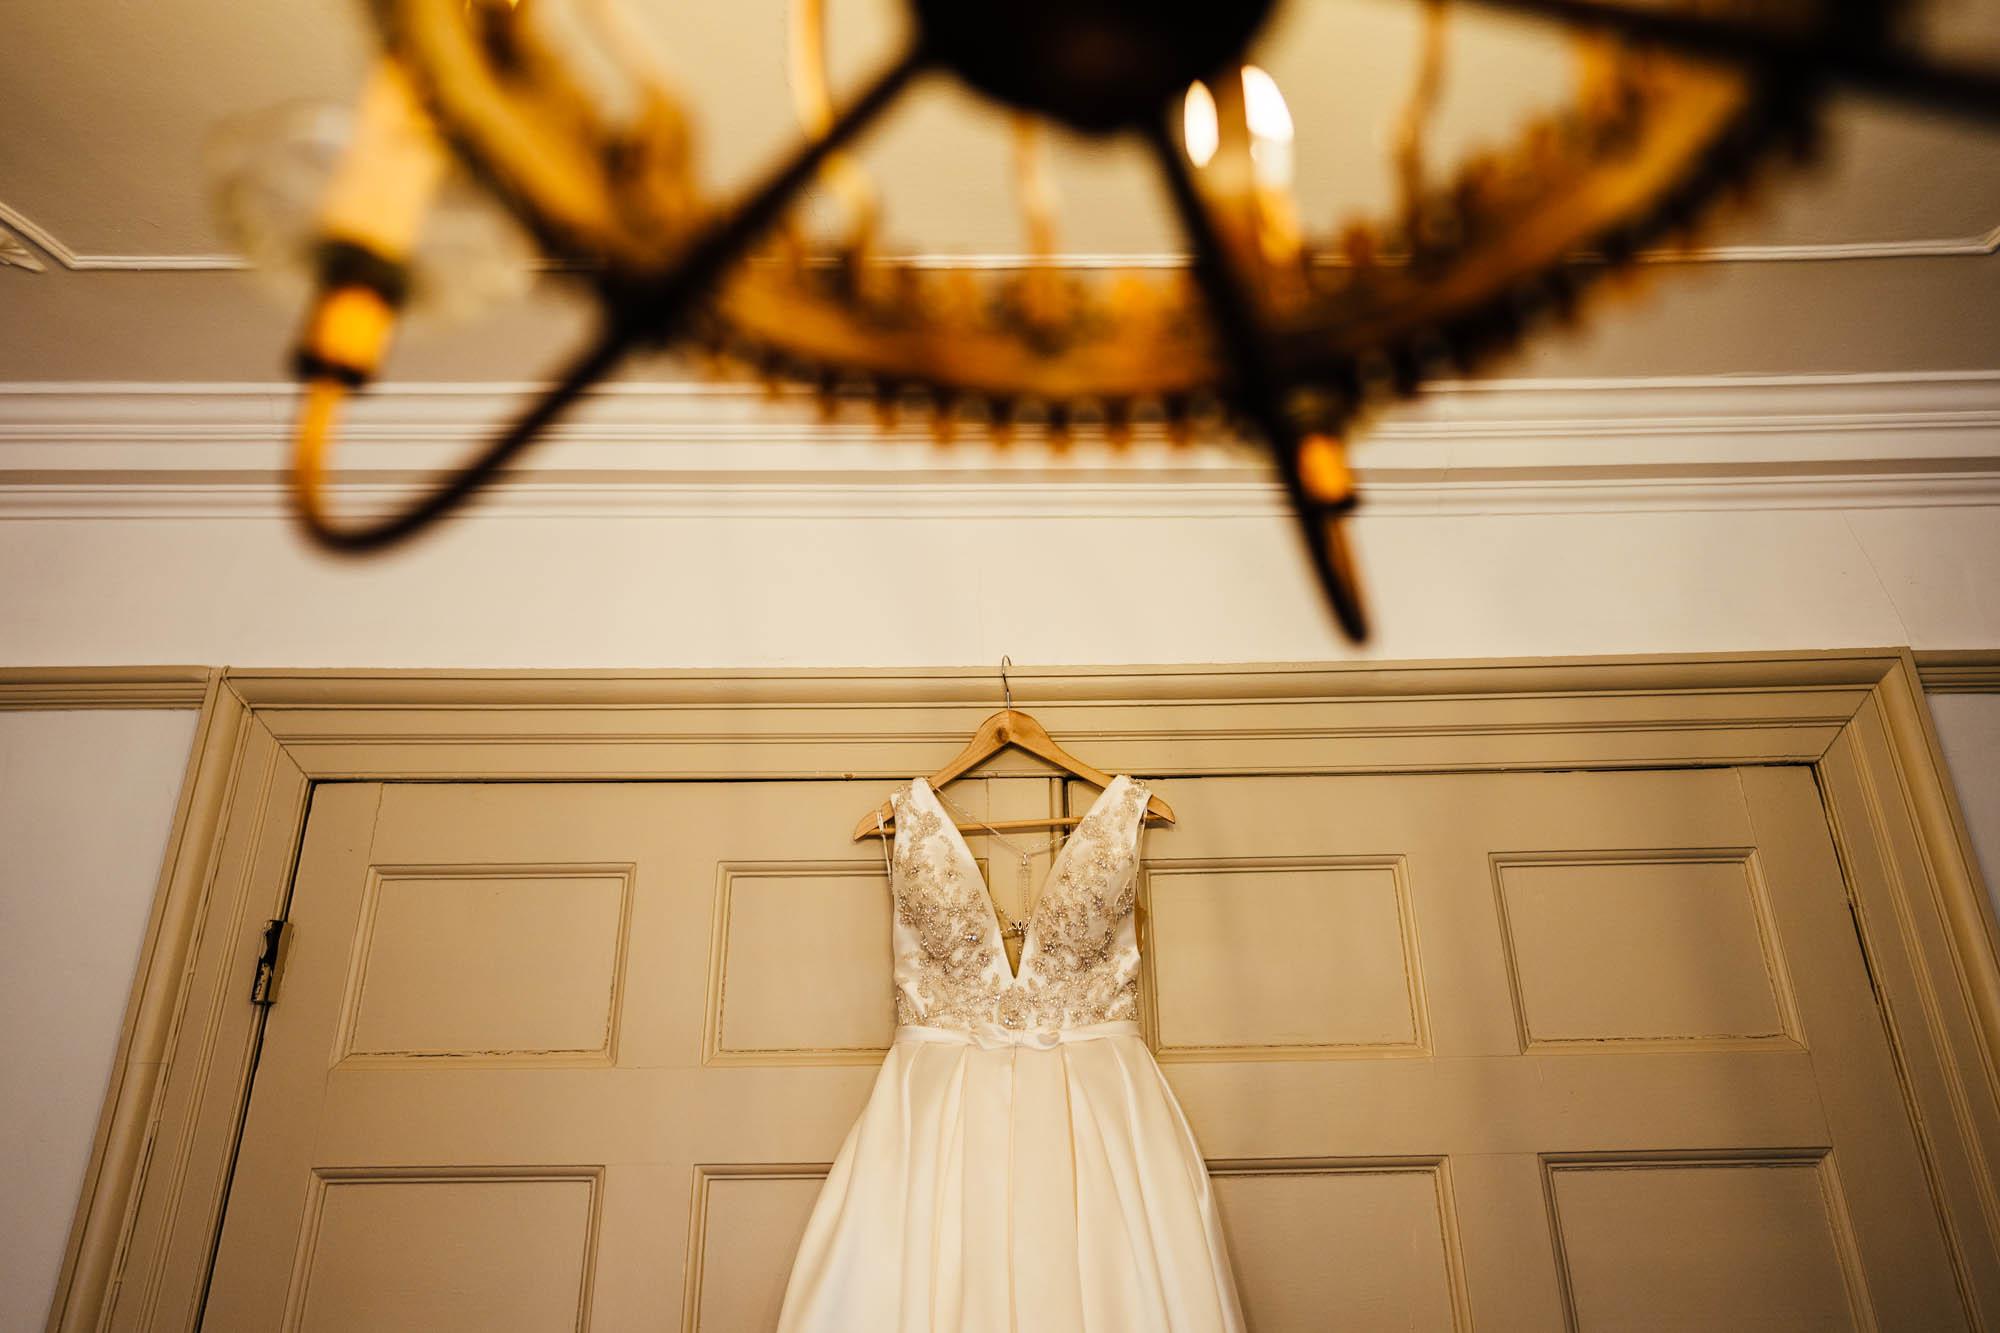 william-cecil-stamford-wedding-3